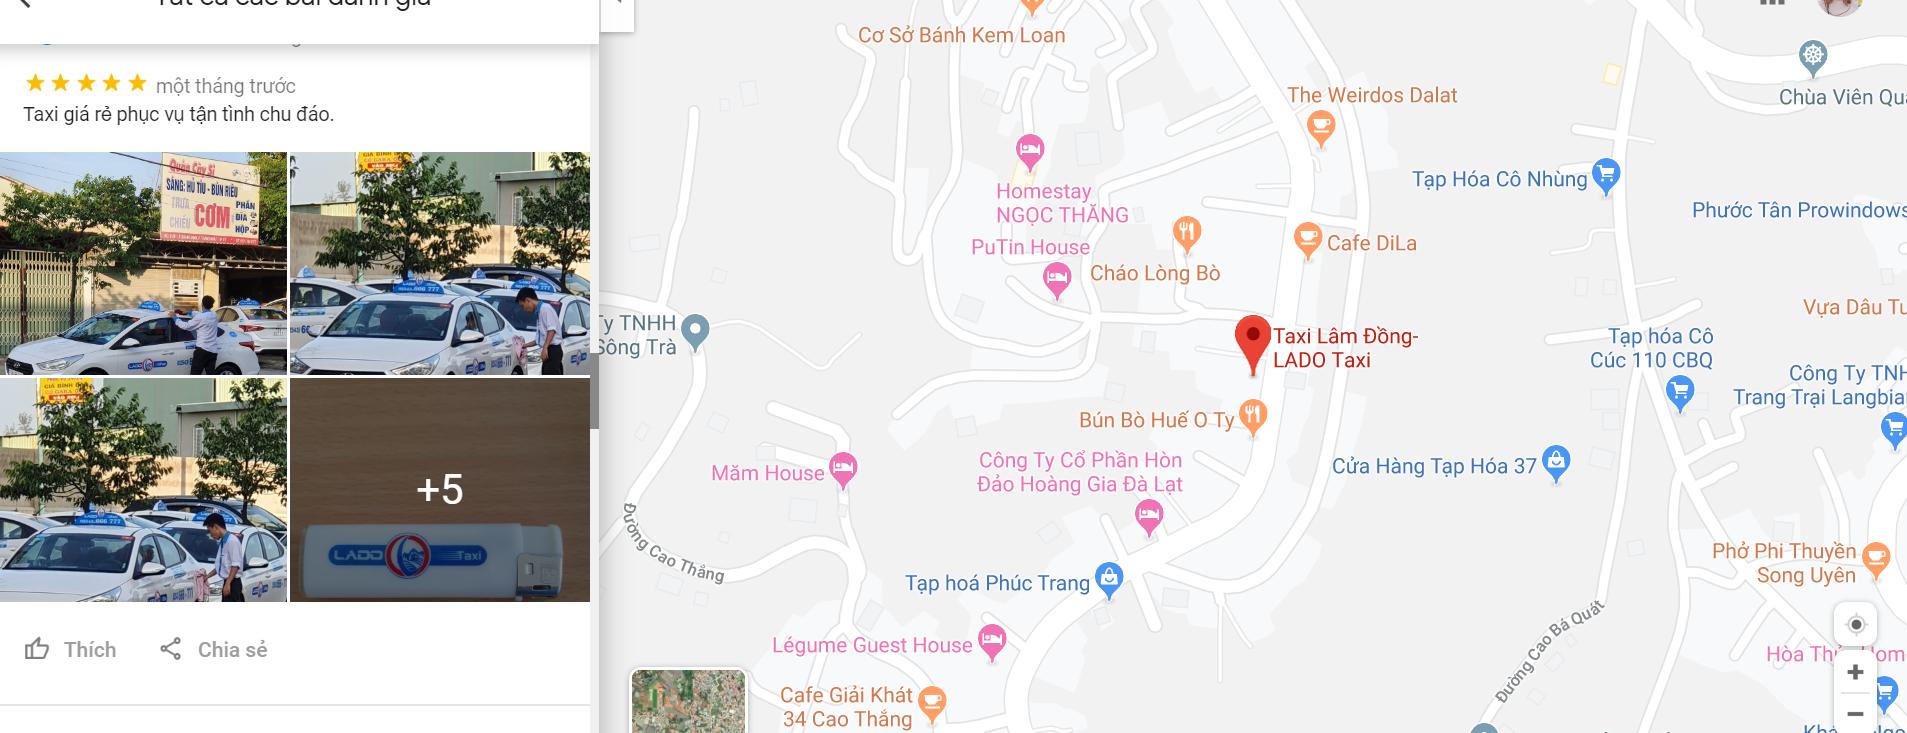 danh-gia-taxi-lado-da-lat-google-map-3